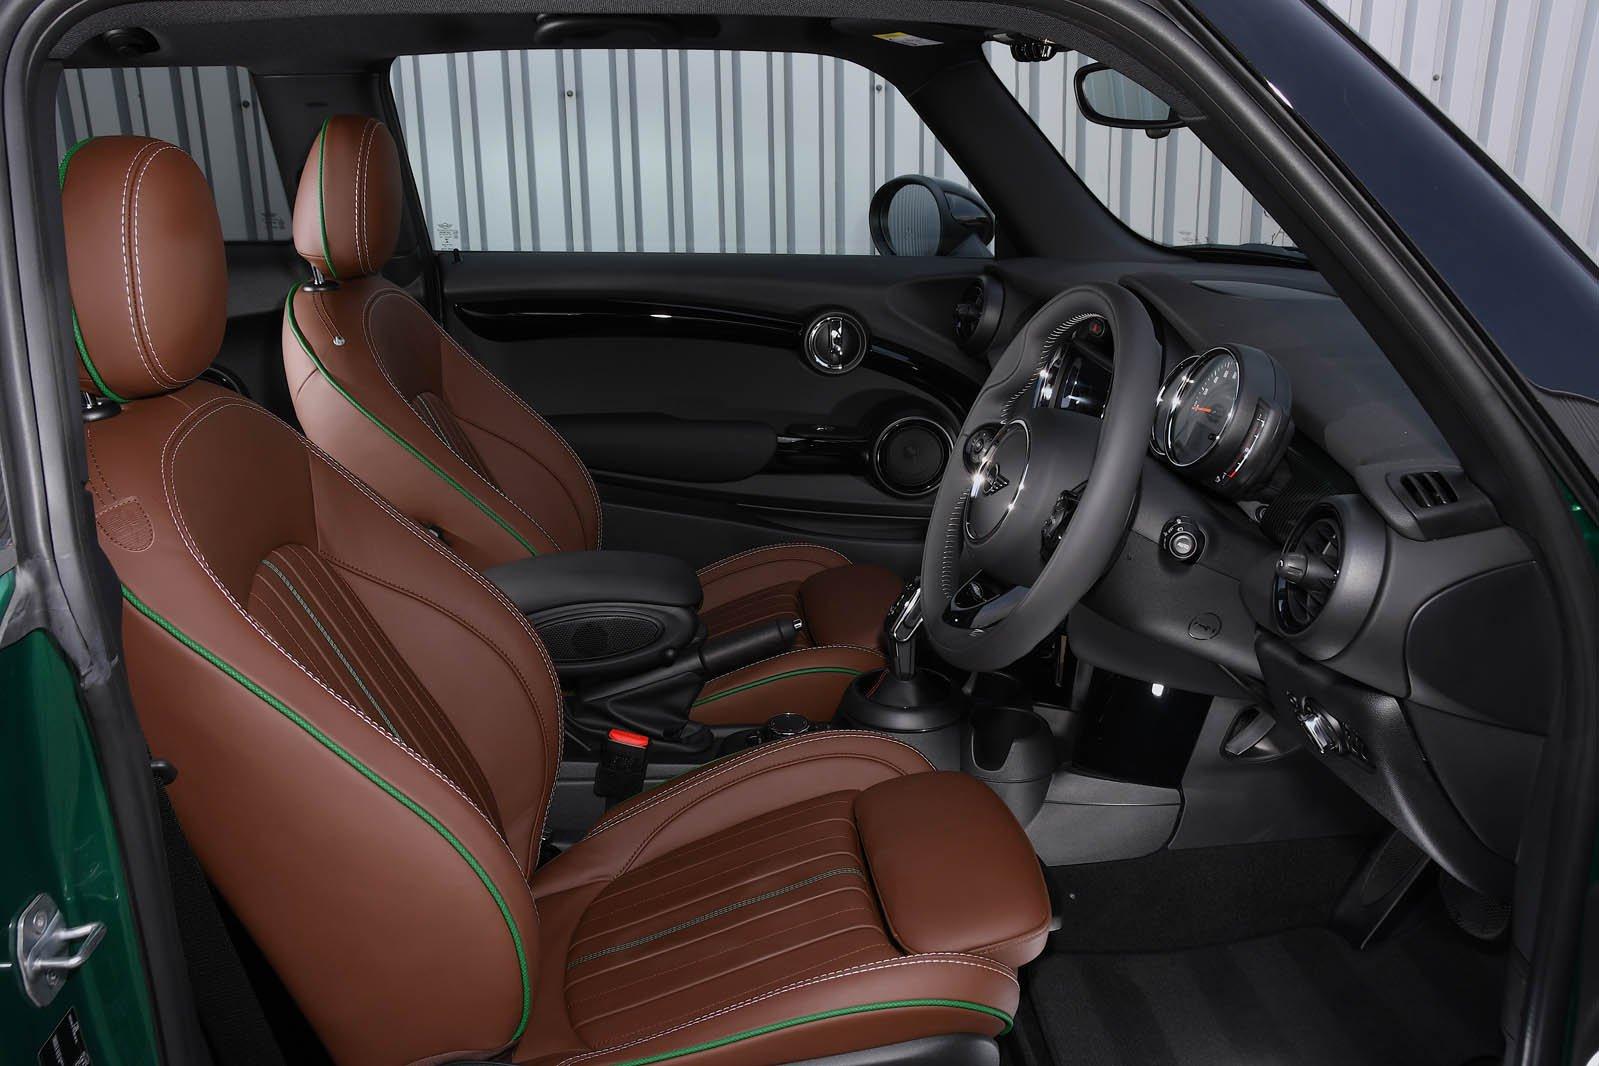 Mini Cooper S 60 Year Edition seats